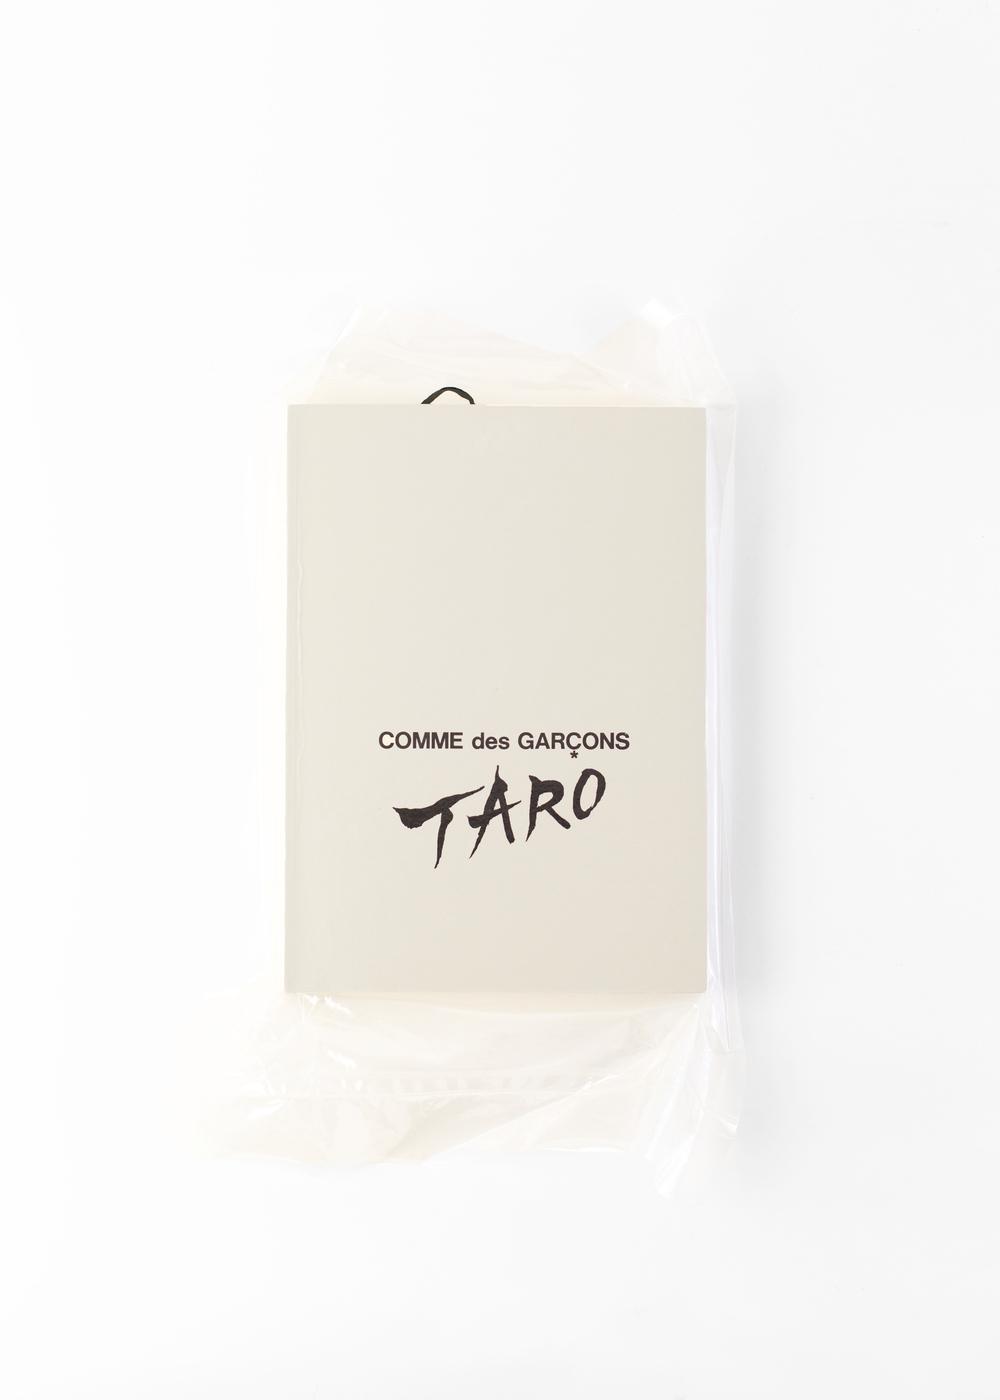 "Comme Des Garçons x Taro Okamoto</br>Notebook 2012</br>€100 <a href=""https://www.paypal.com/cgi-bin/webscr?cmd=_s-xclick&hosted_button_id=9D9PU8ZDH5UEW"">Add to Cart</a>"